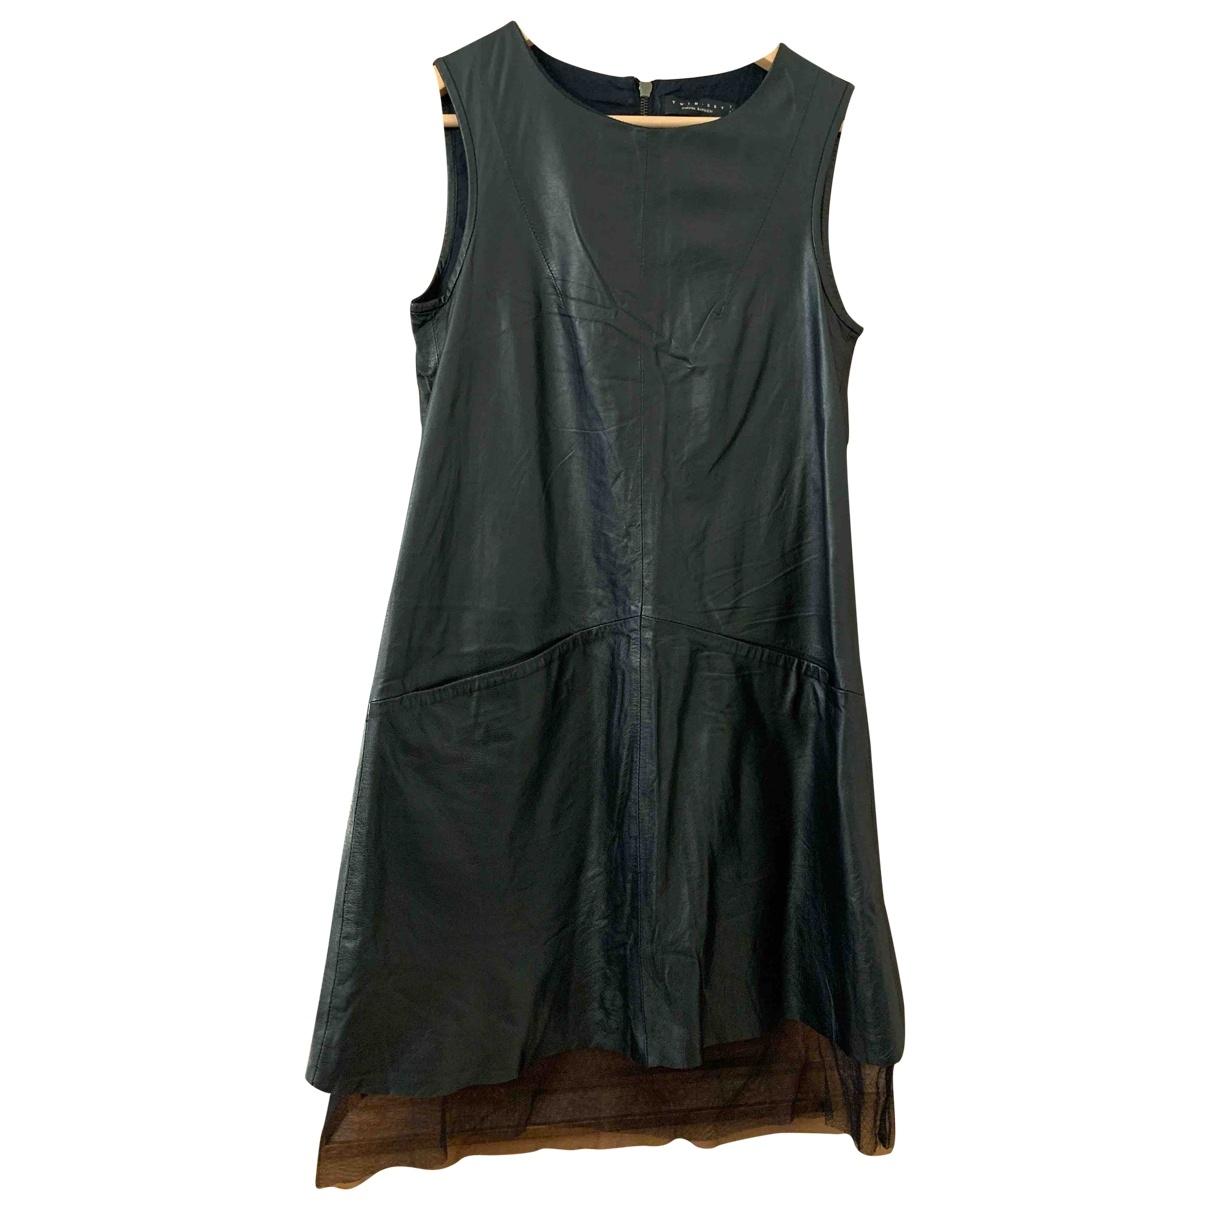 Twin Set \N Black Leather dress for Women S International